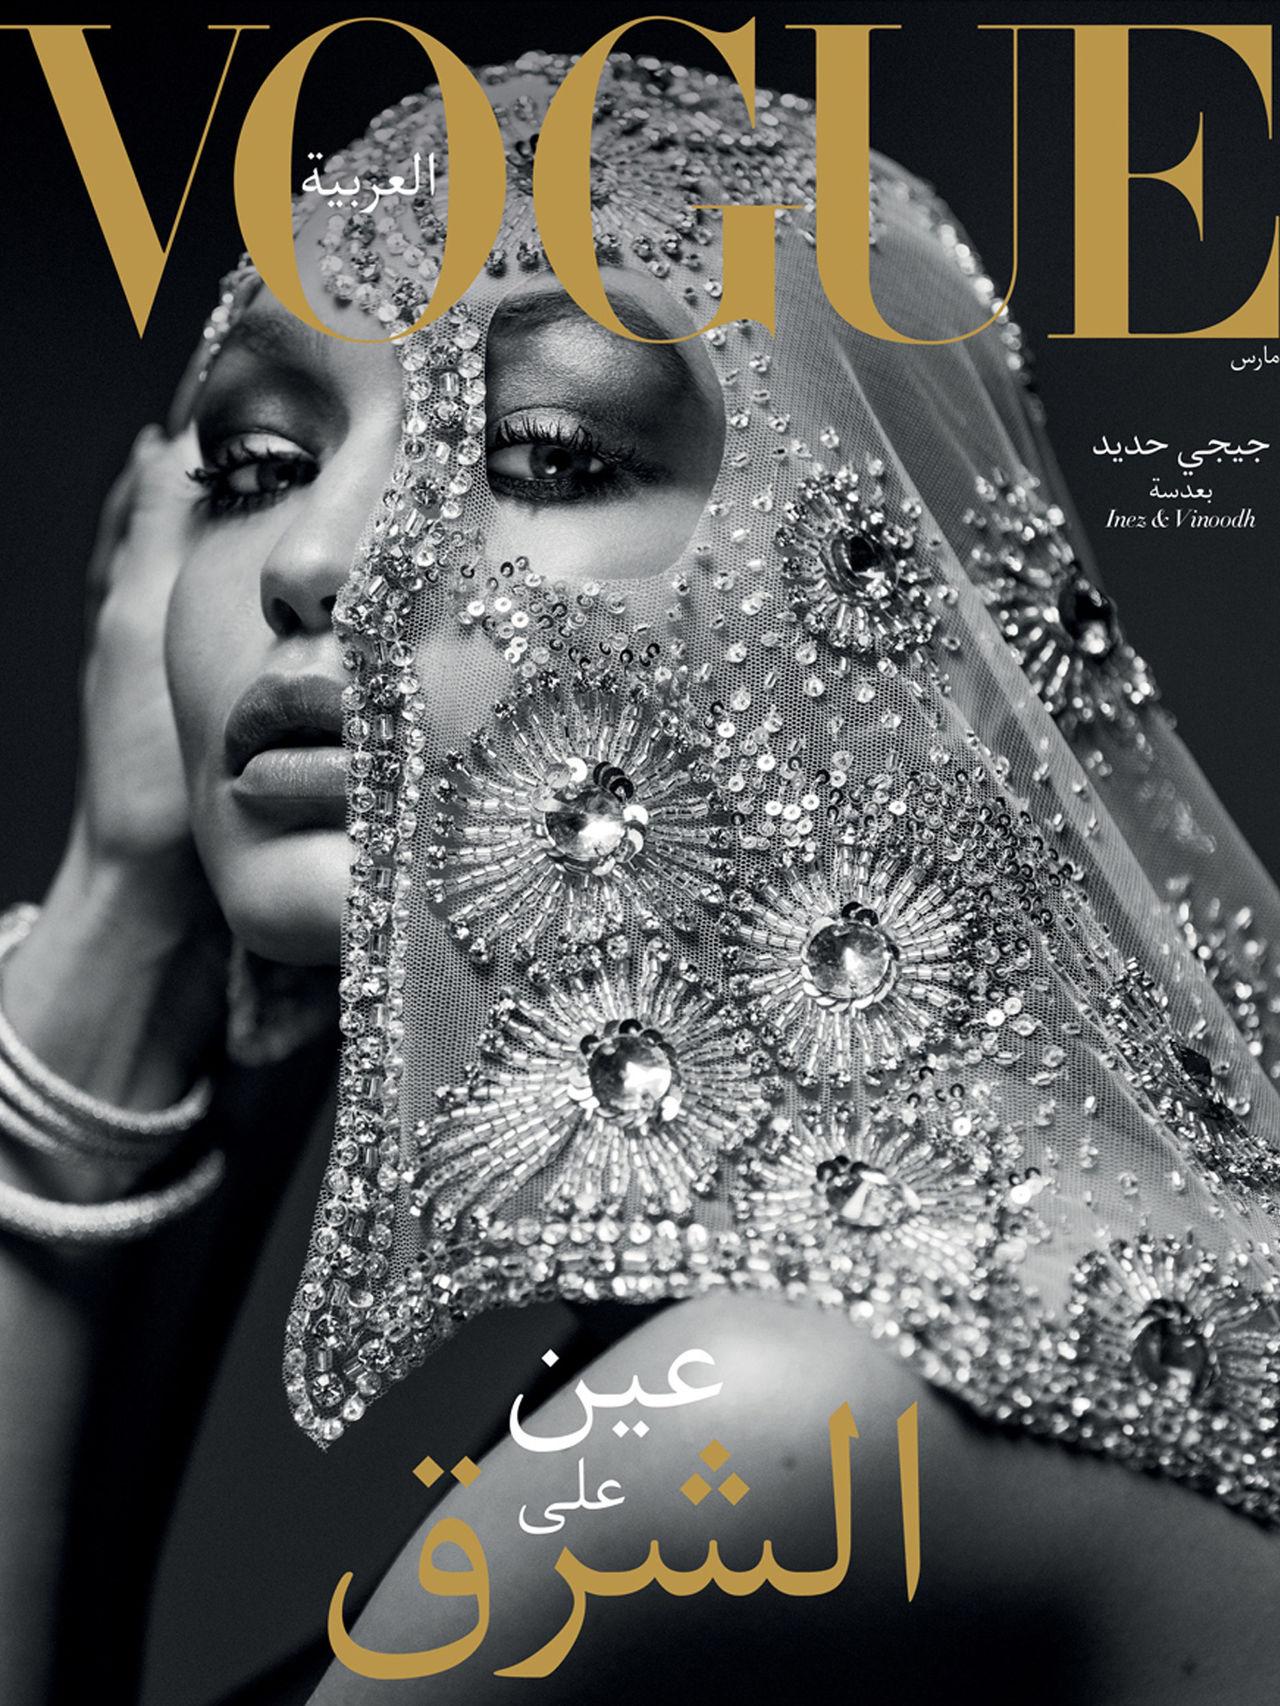 Ms.Abdulaziz's first cover, featuring Gigi Hadid, March 2017. Photo by Inez & Vinoodh.